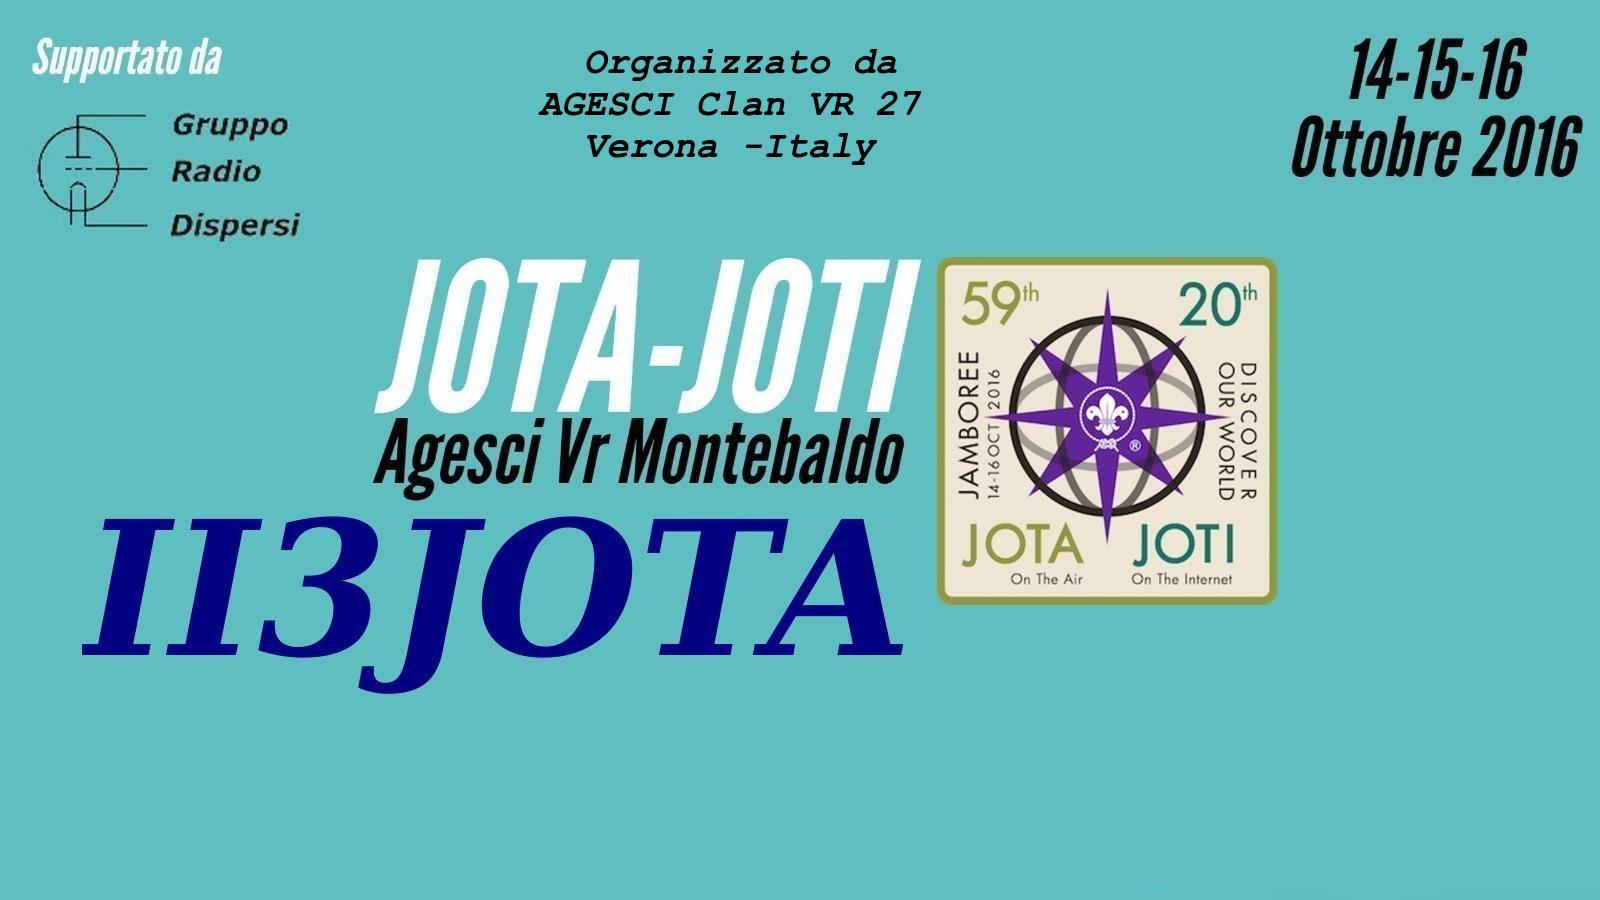 Nominativo Speciale II3JOTA